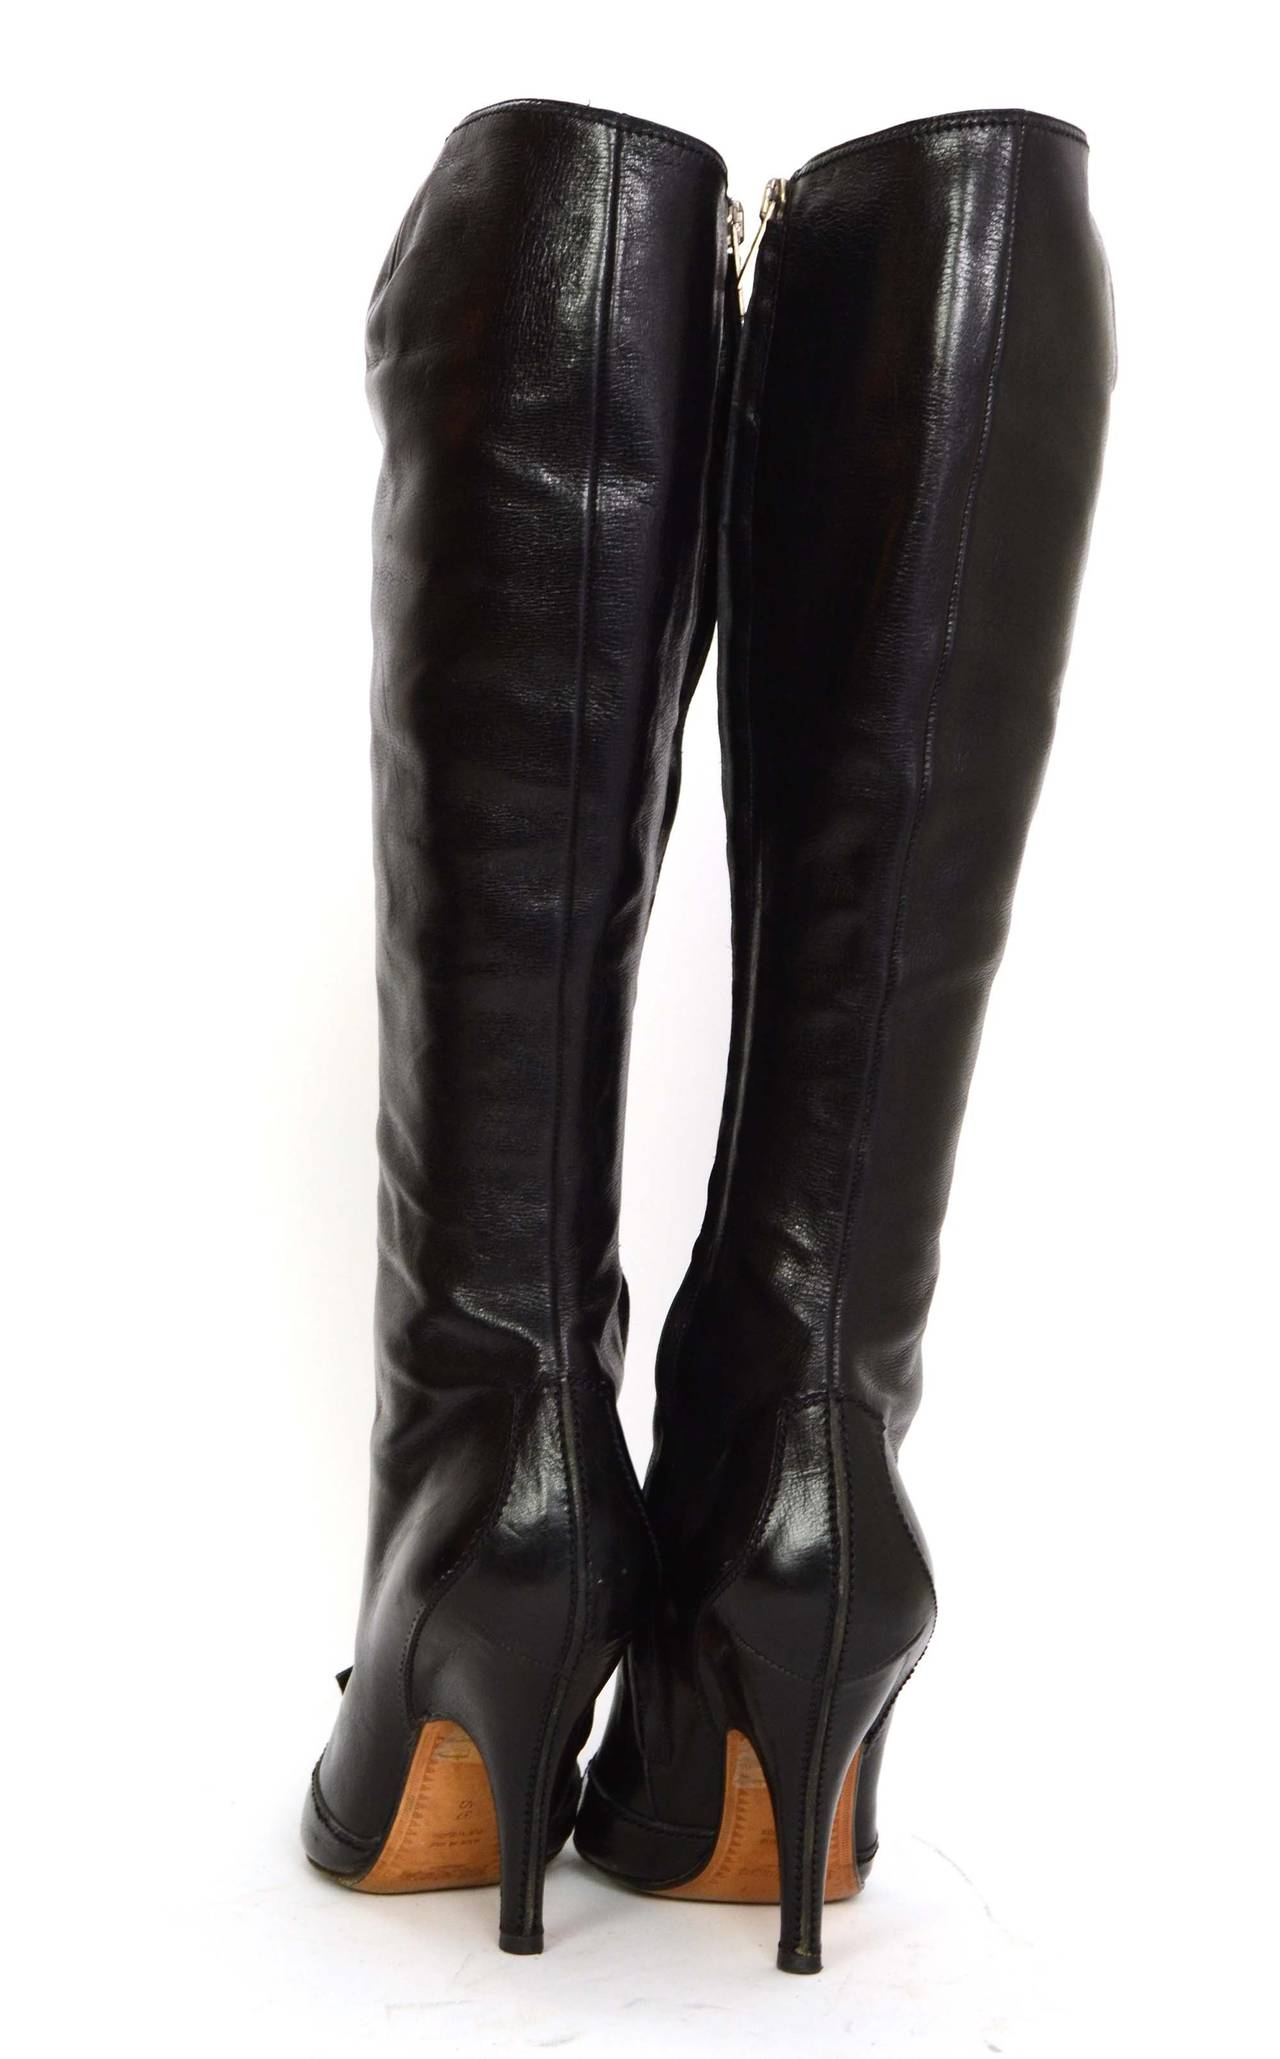 YVES SAINT LAURENT YSL Black Leather Tall Boots sz 37.5 4